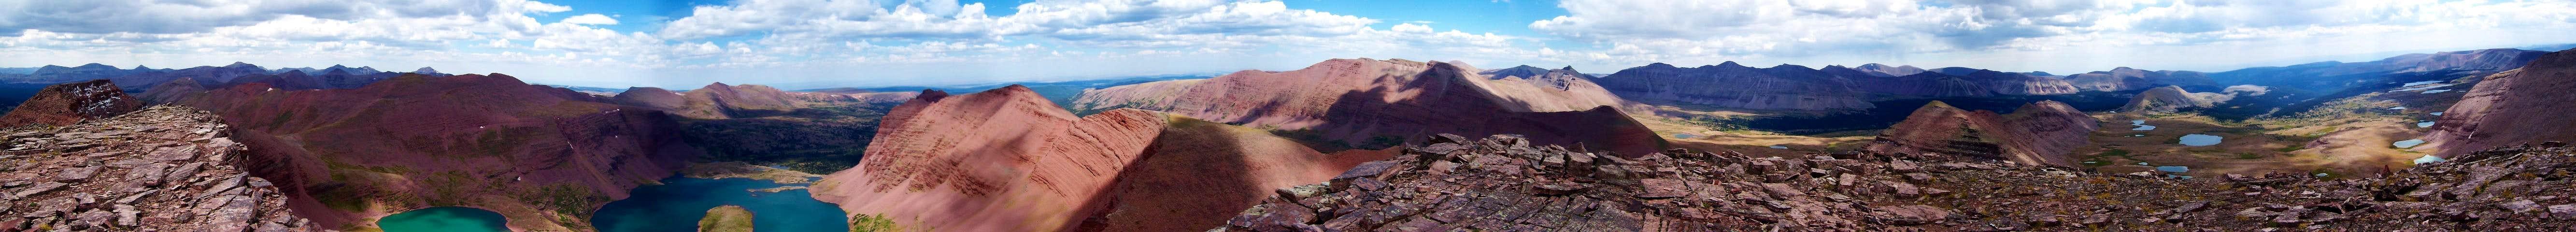 Wilson Peak Climbing Hiking Mountaineering Summitpost